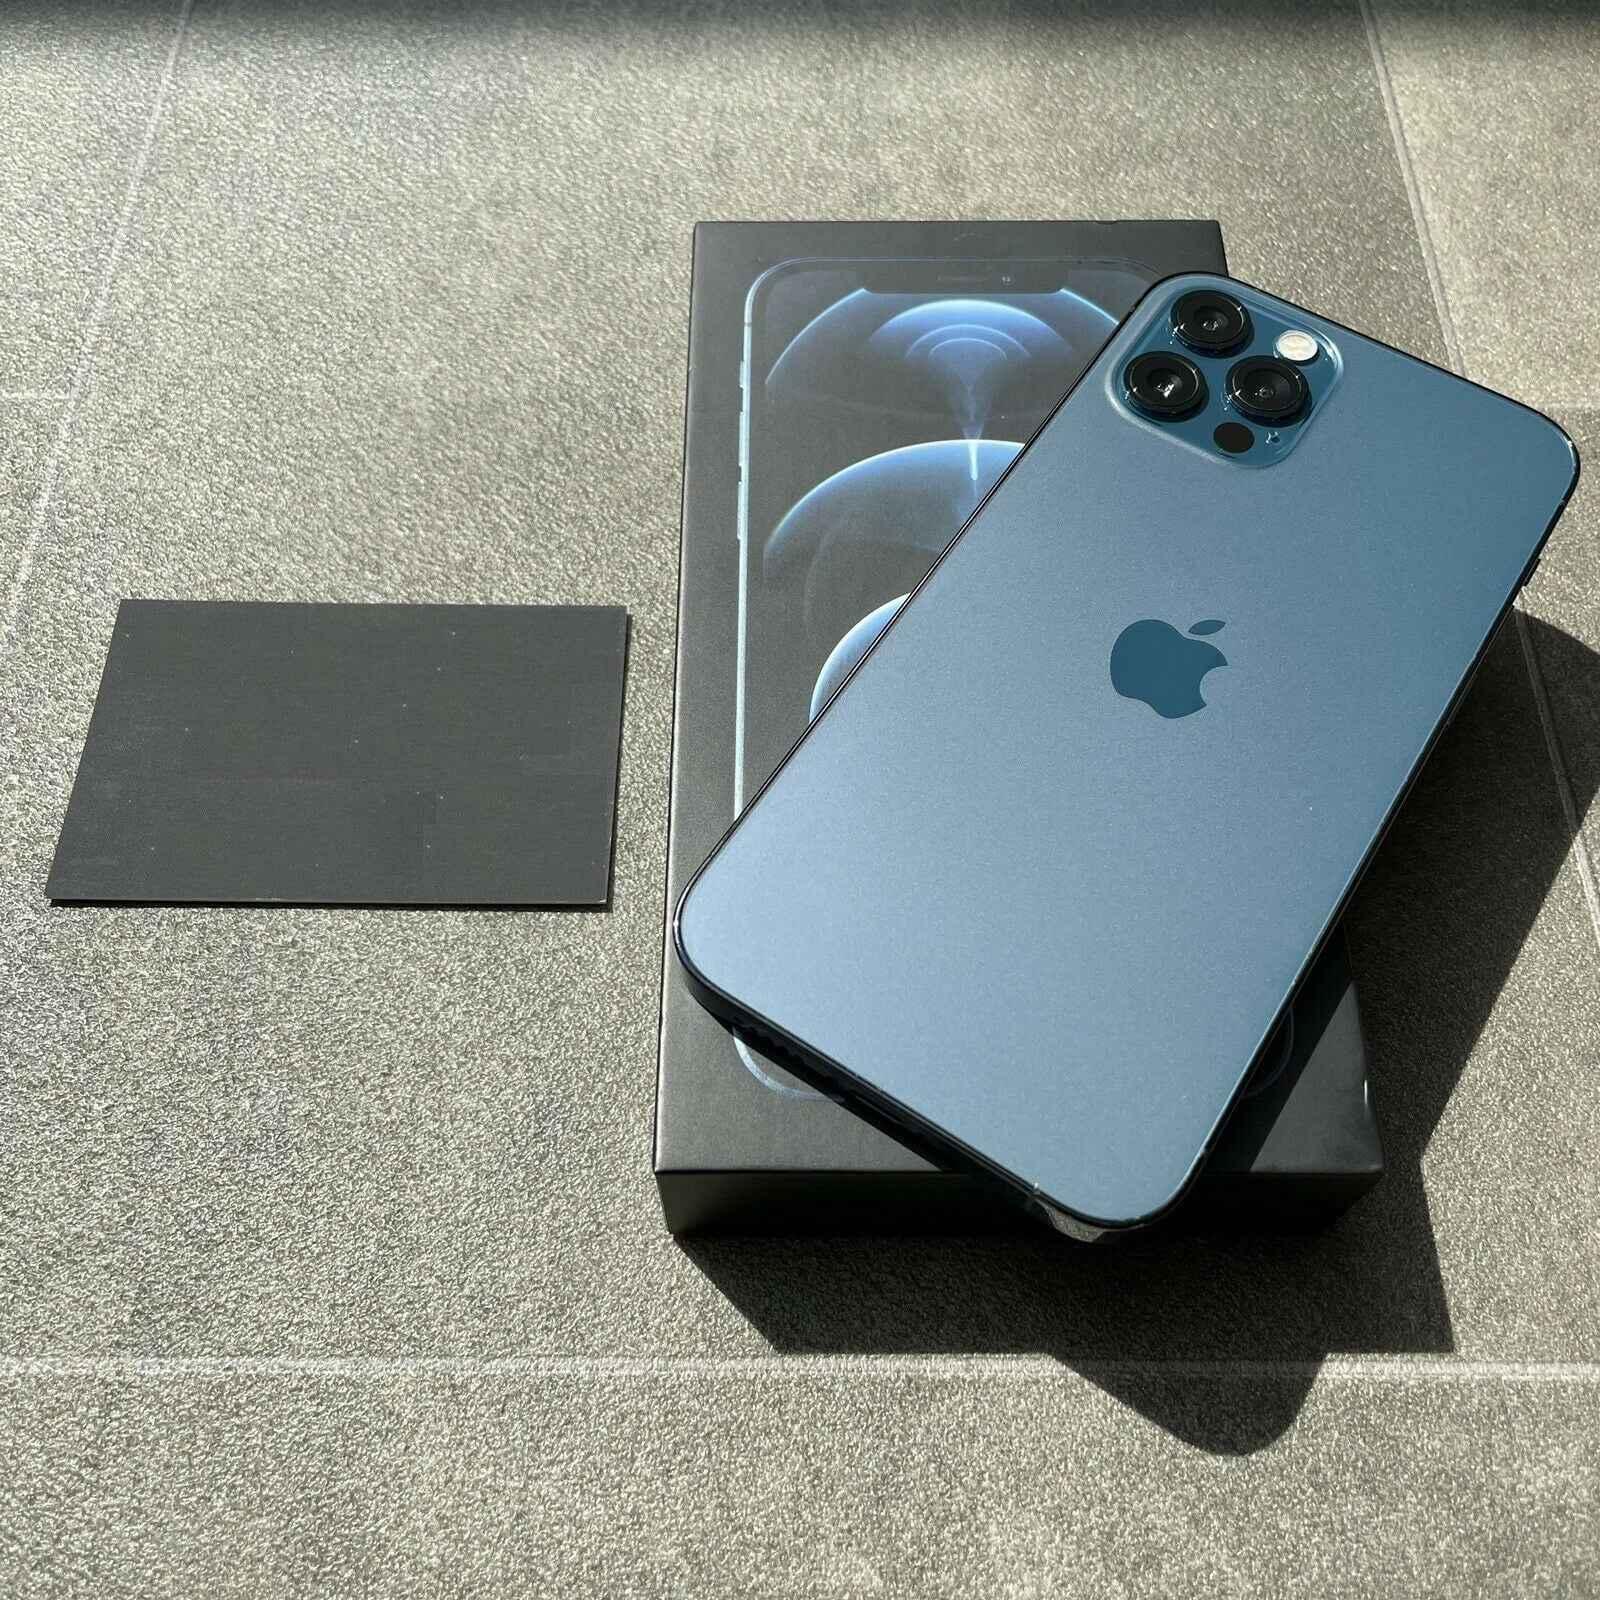 iPhone 12 Pro max 512GB Lubaczów - zdjęcie 1